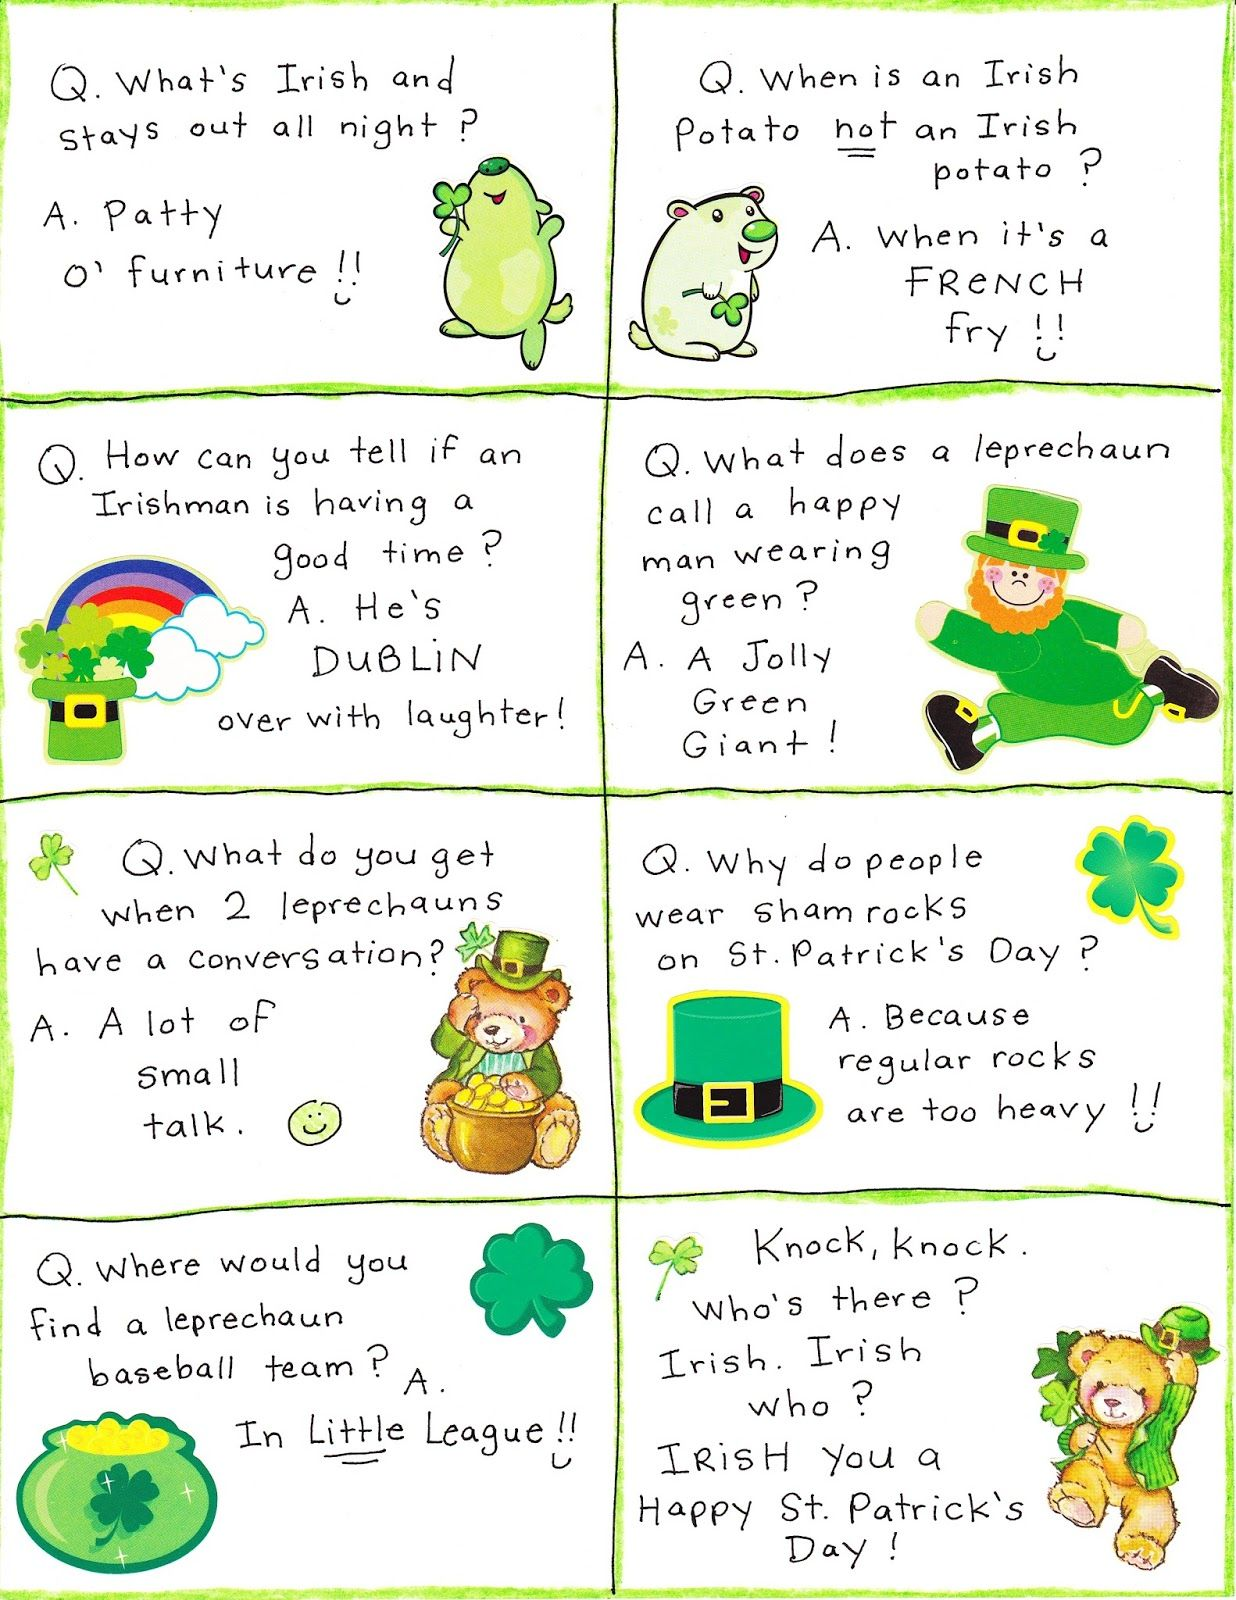 St Patrick S Day Irish Jokes Limericks Riddles One Liners Short Clean Irish Stories